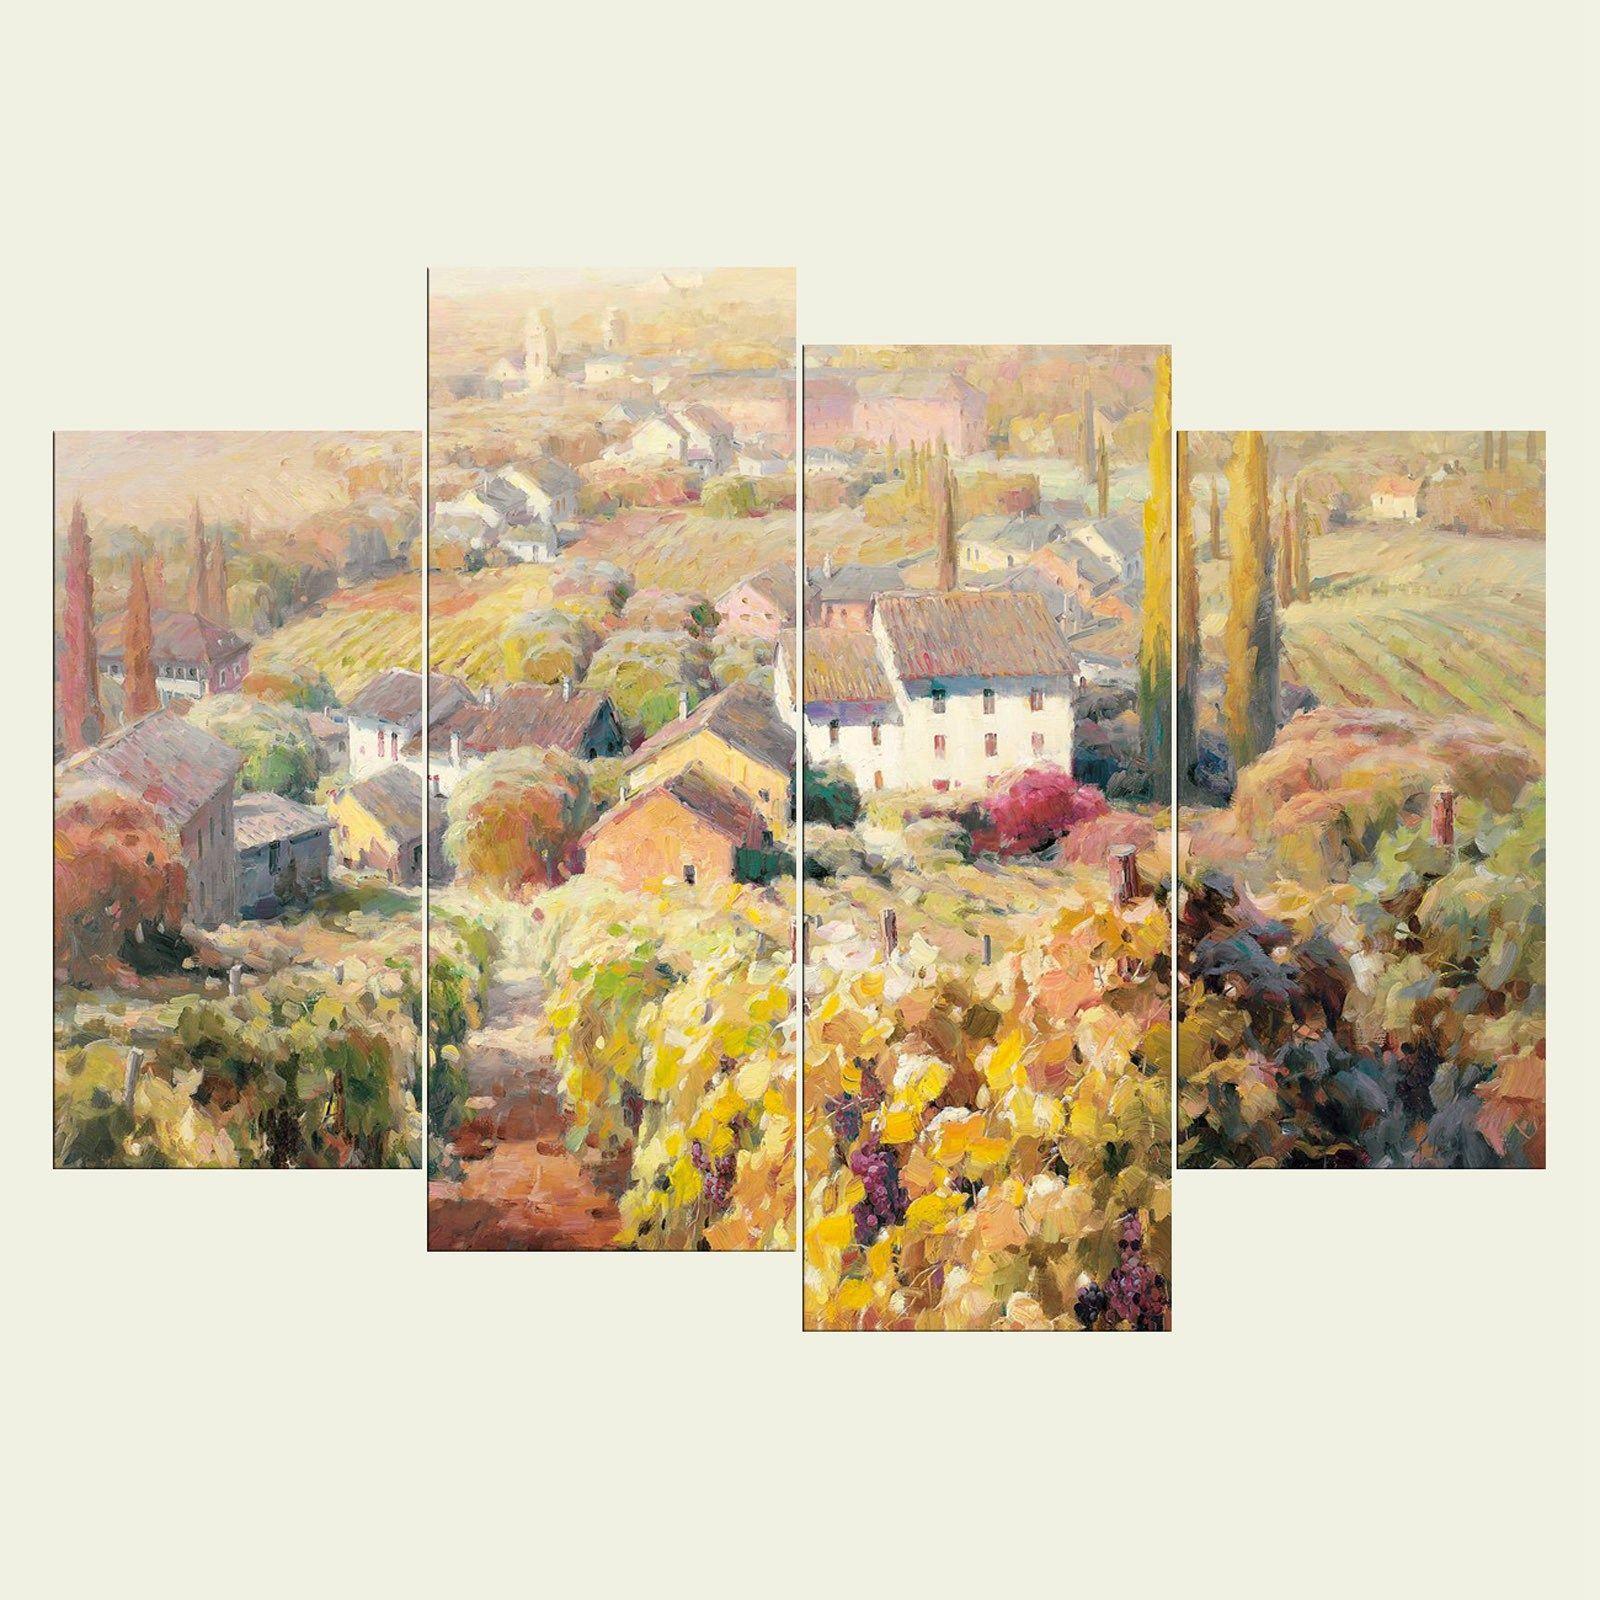 2018 No FrameTown Scenery Series Hd Canvas Print Wall Art Oil ...